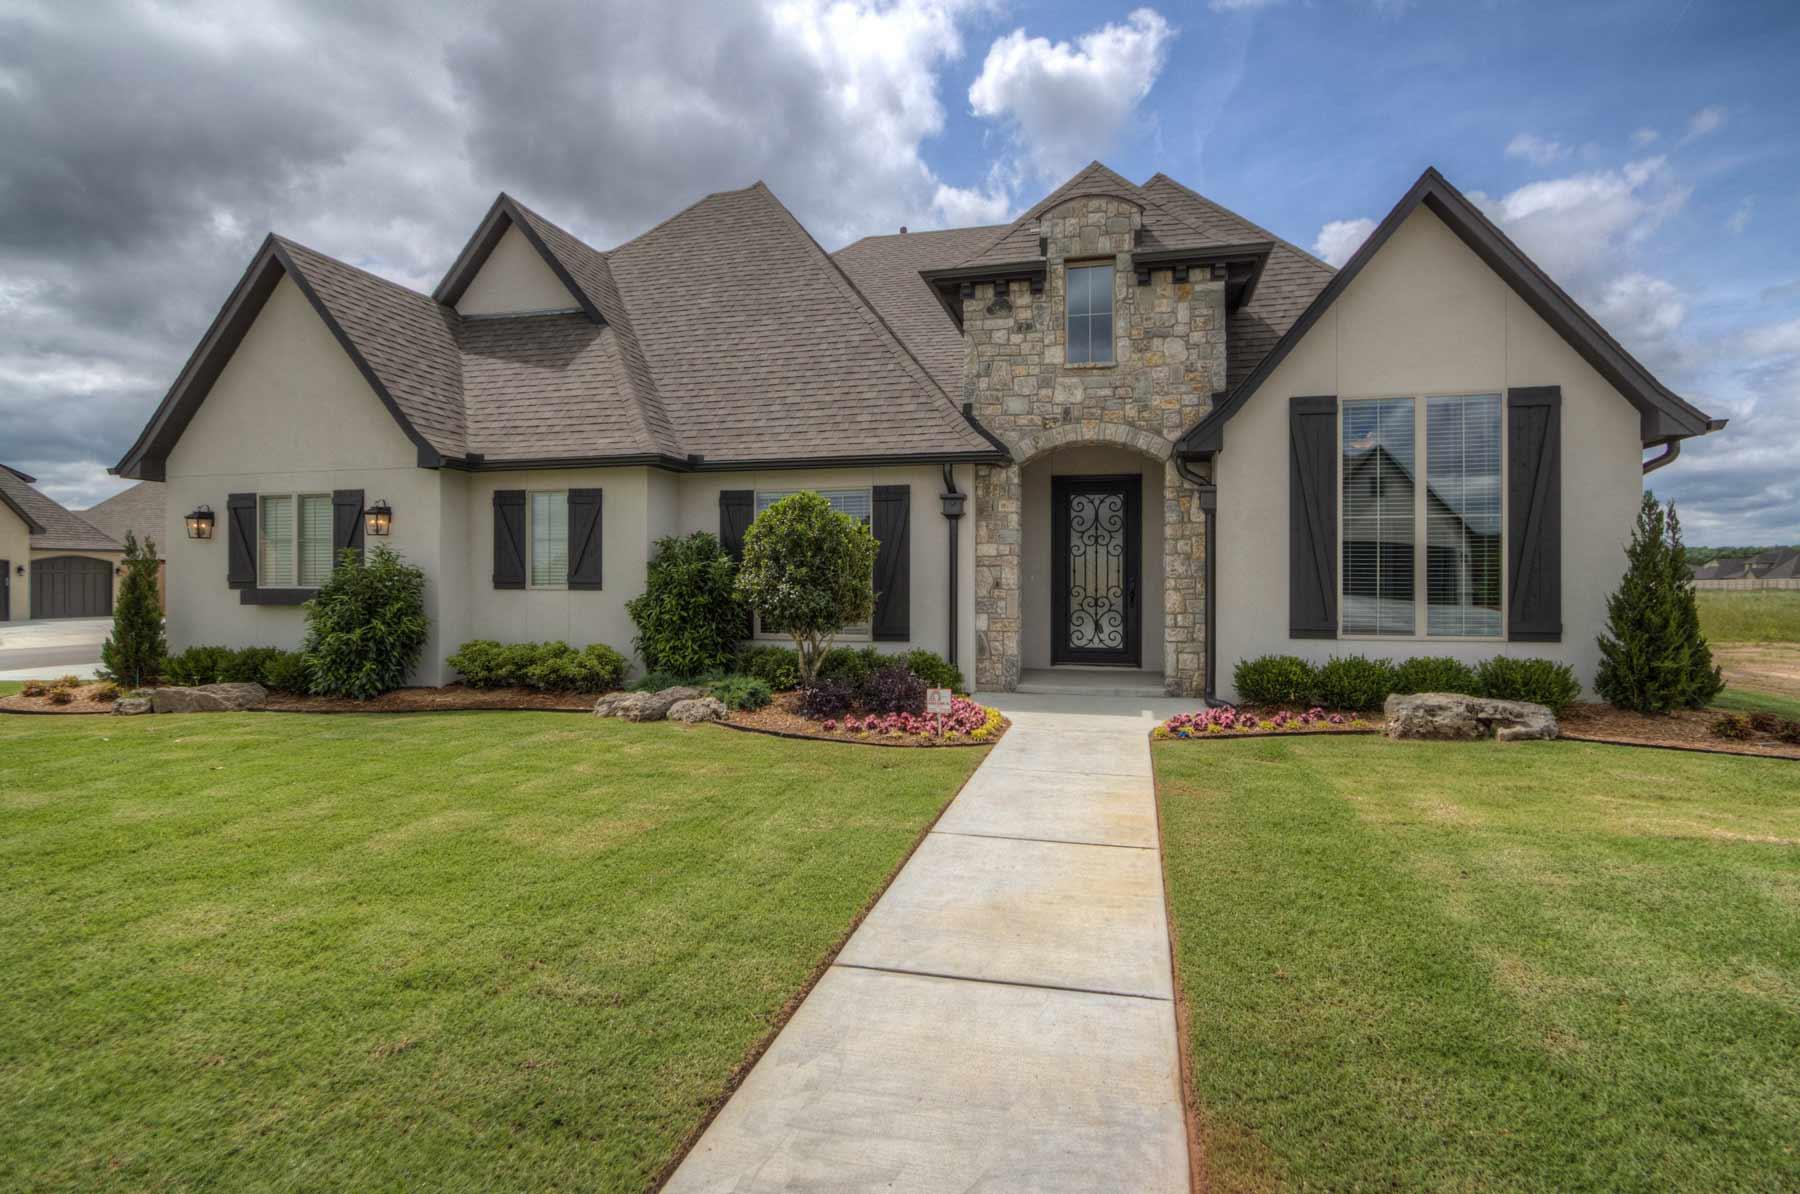 Southern homes award winning tulsa custom home builder for Southern custom homes